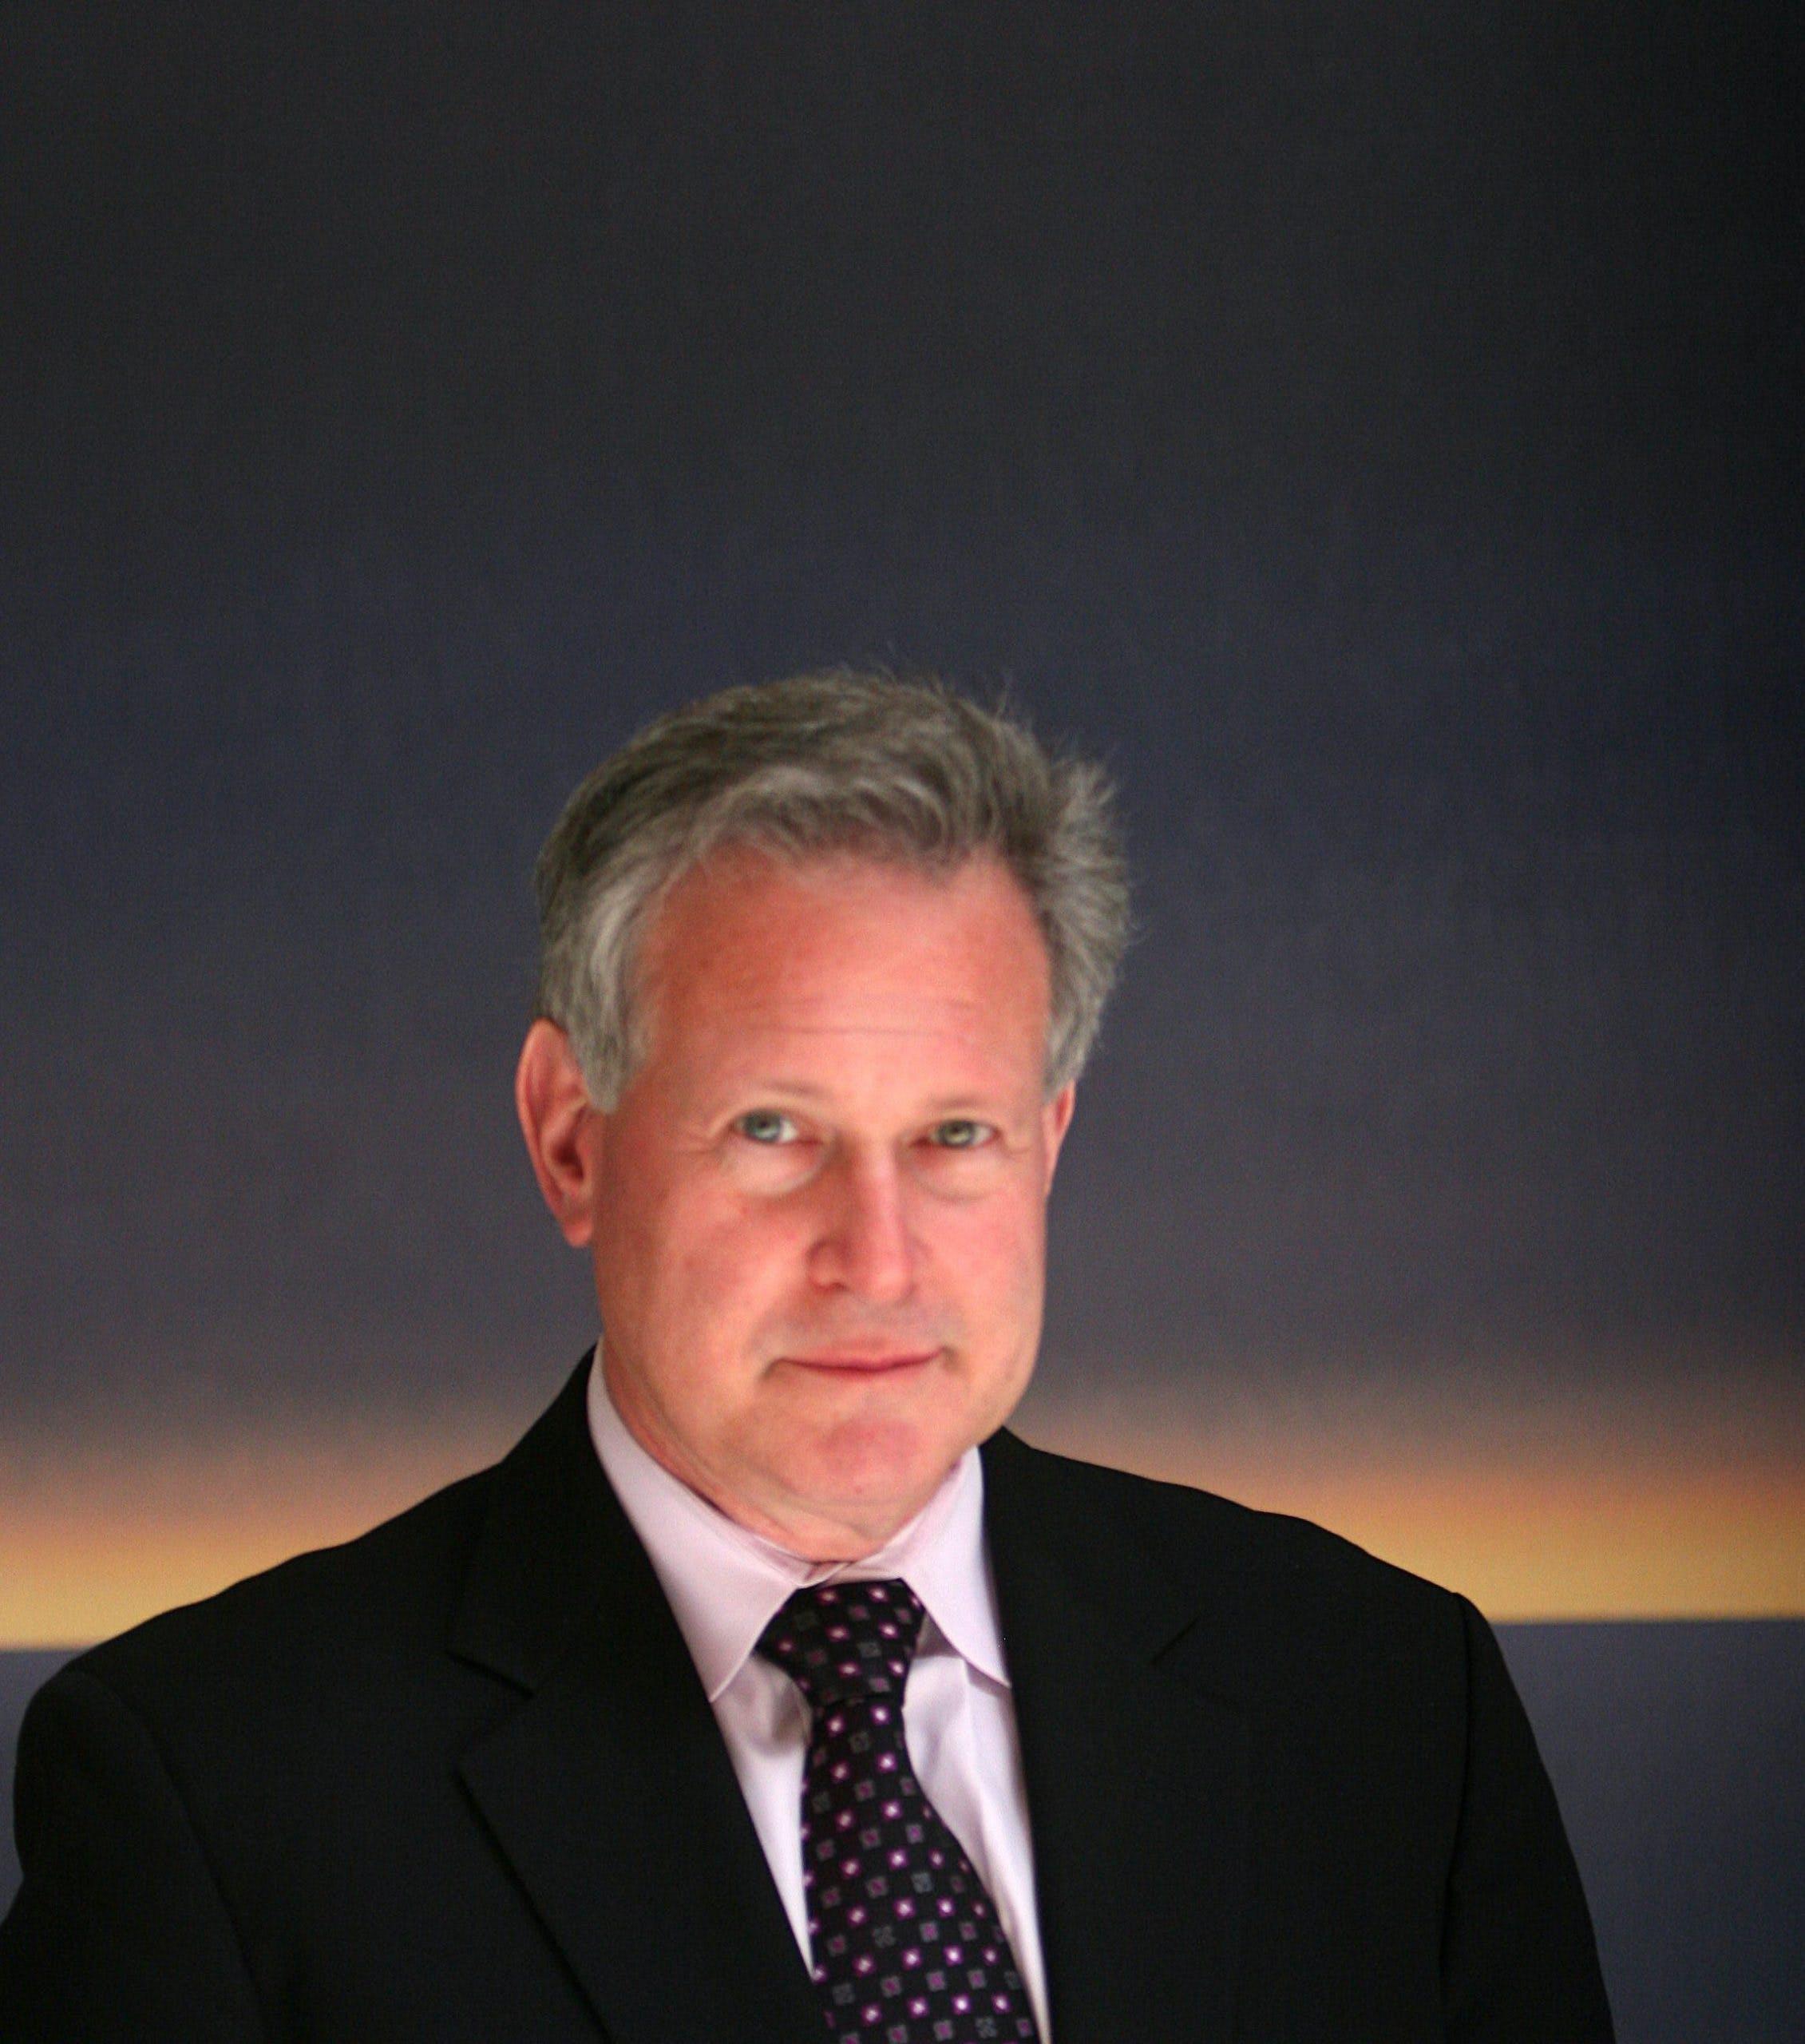 Robert Lustig, MD, MSL, author of Metabolical